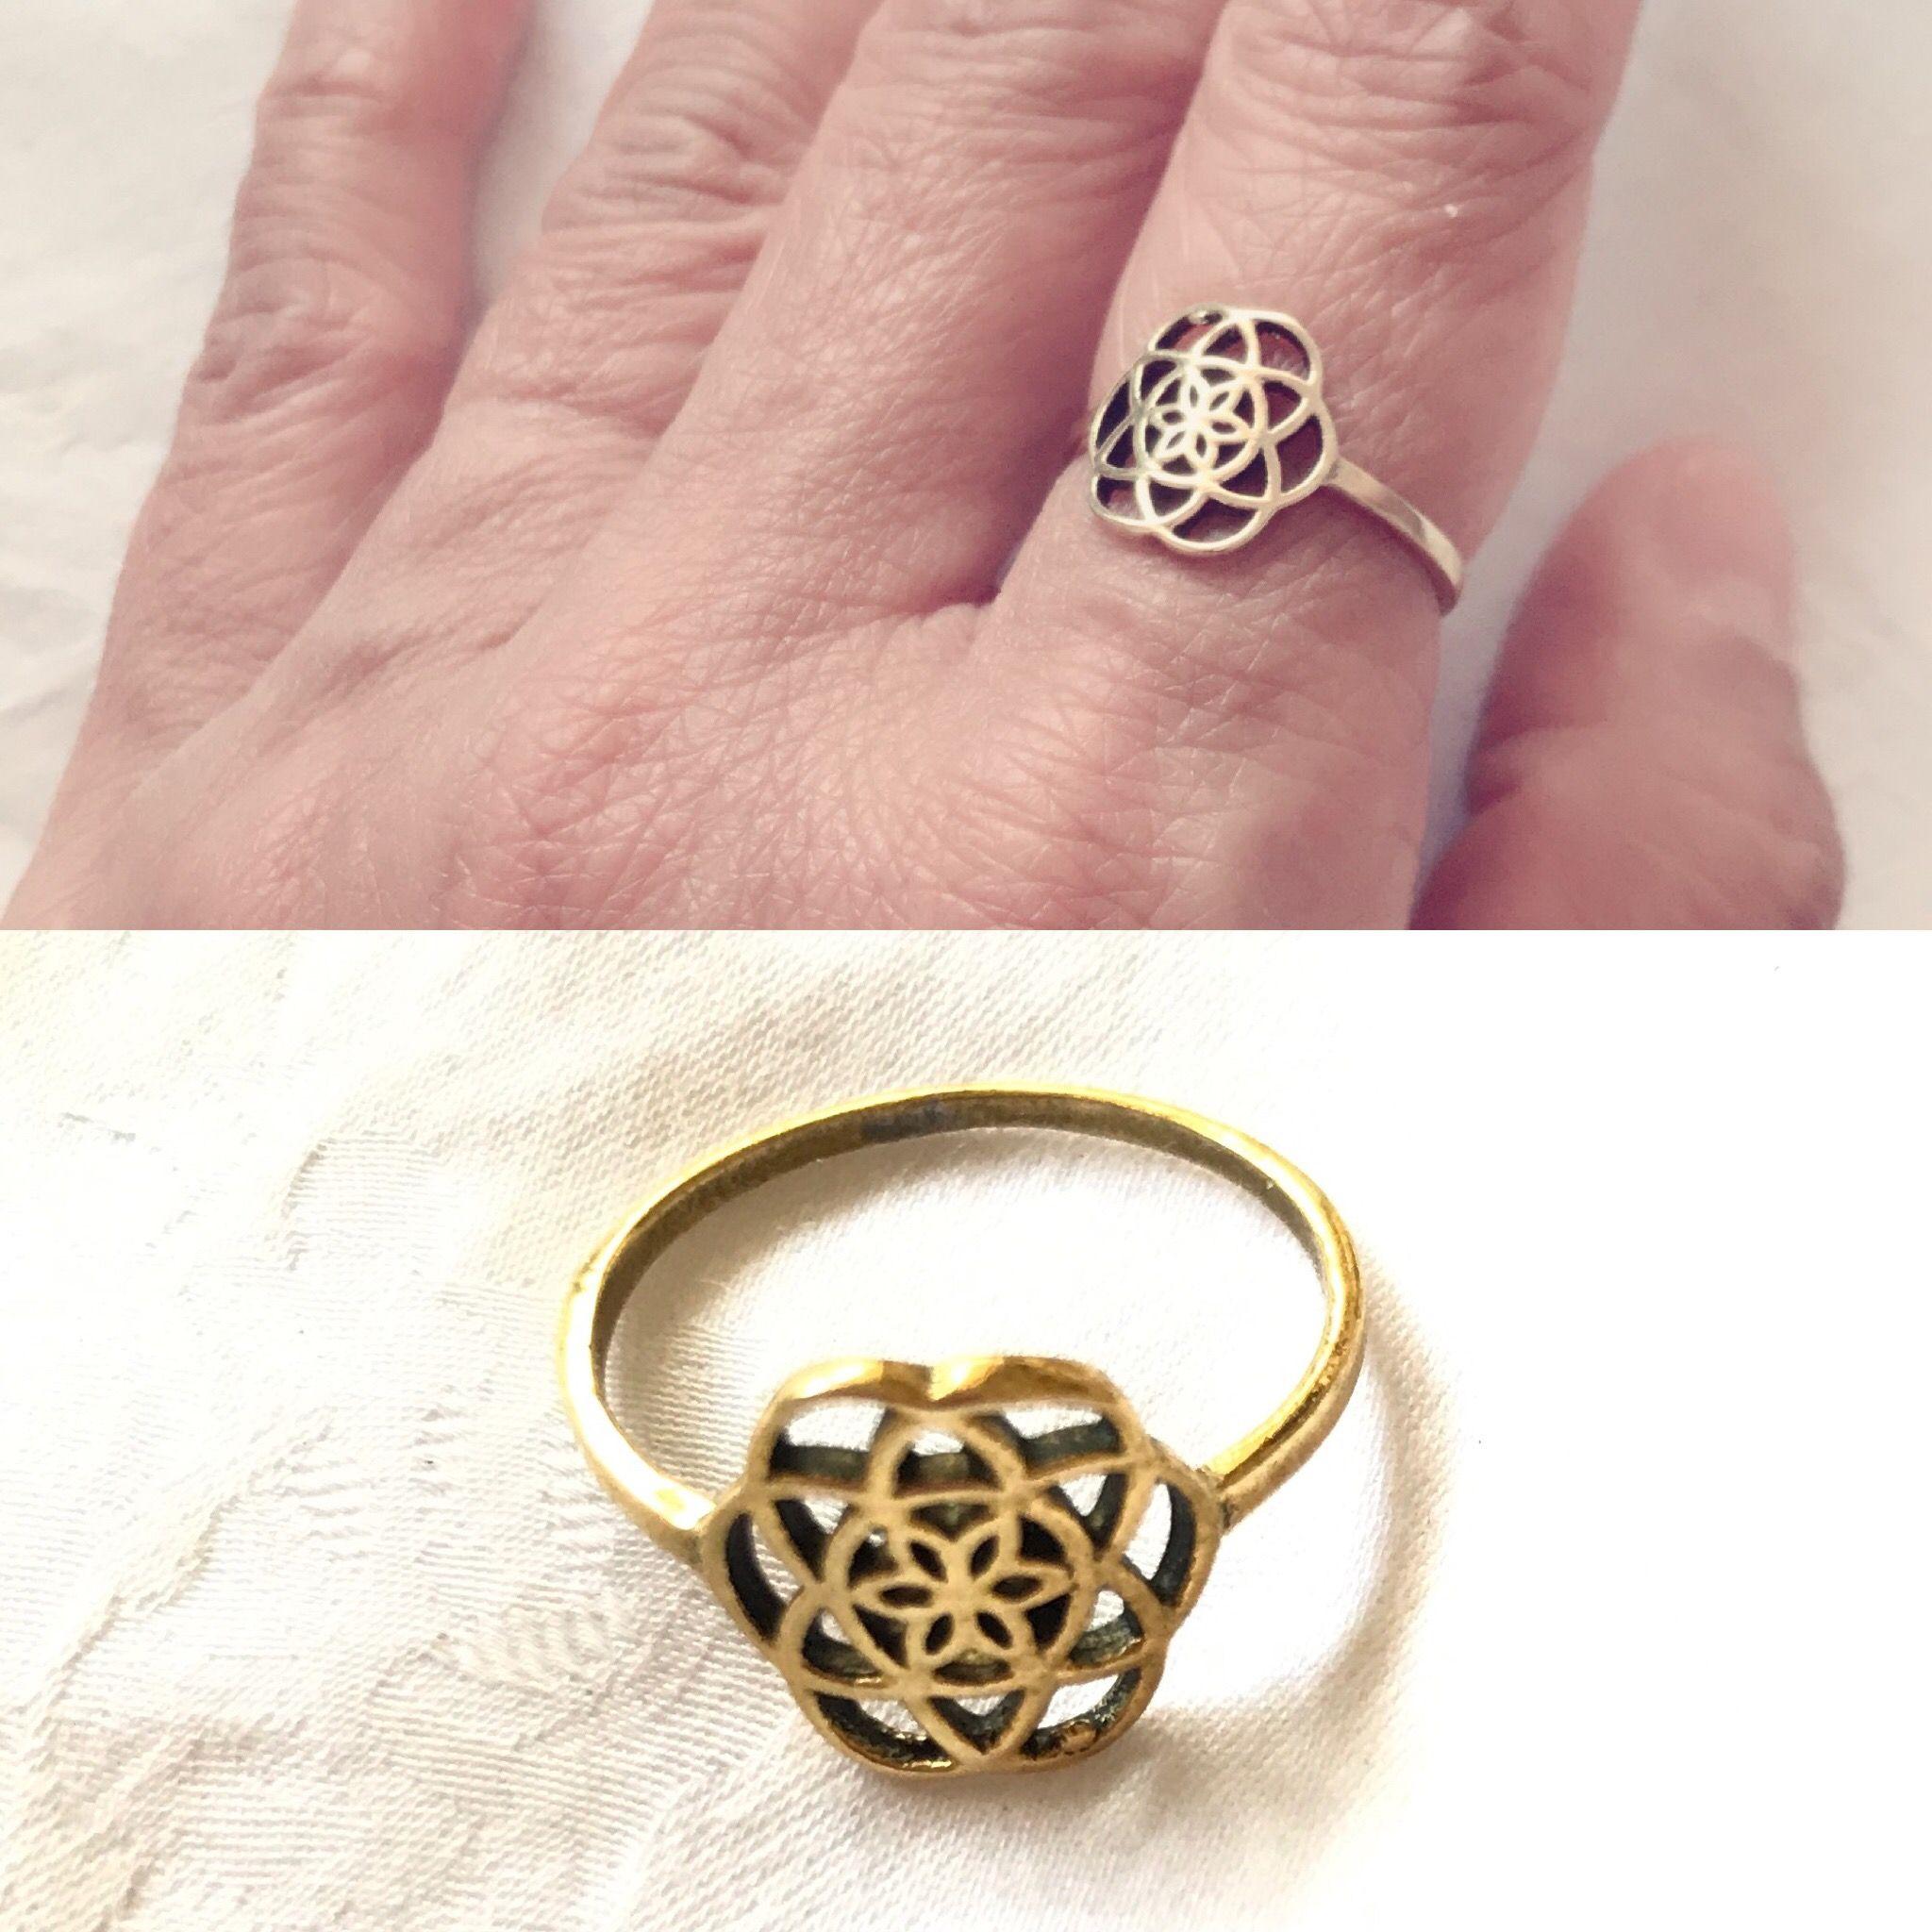 Flower of life ring | Alpha Ion | Pinterest | Ring